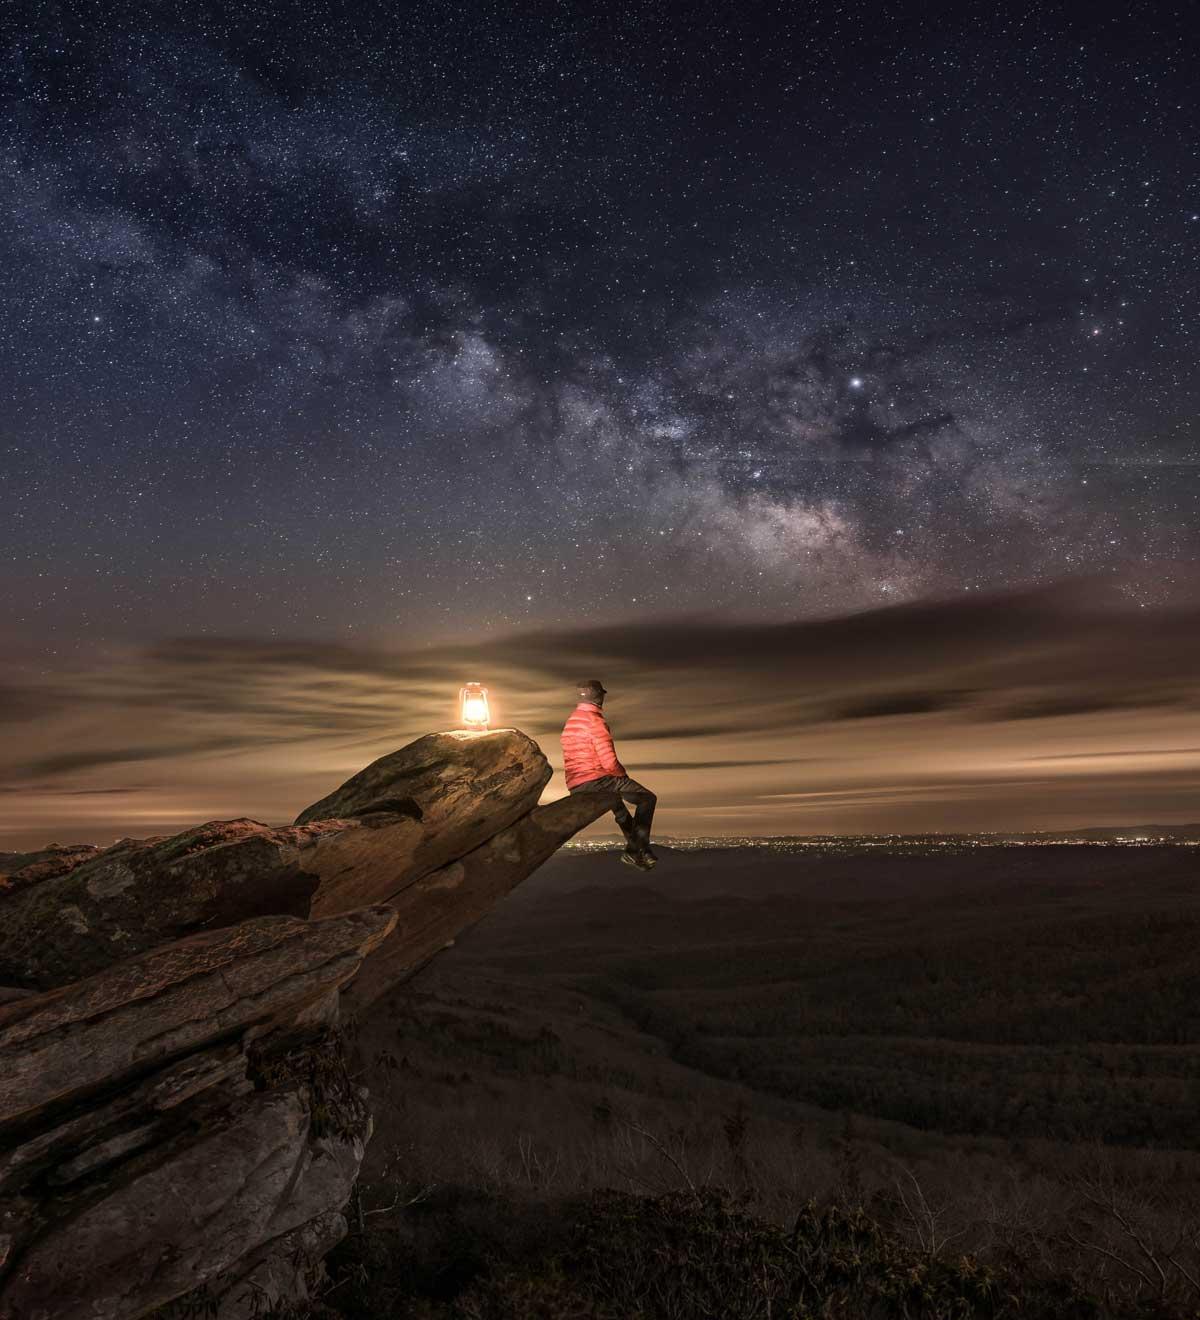 Photographer: Tom Moors